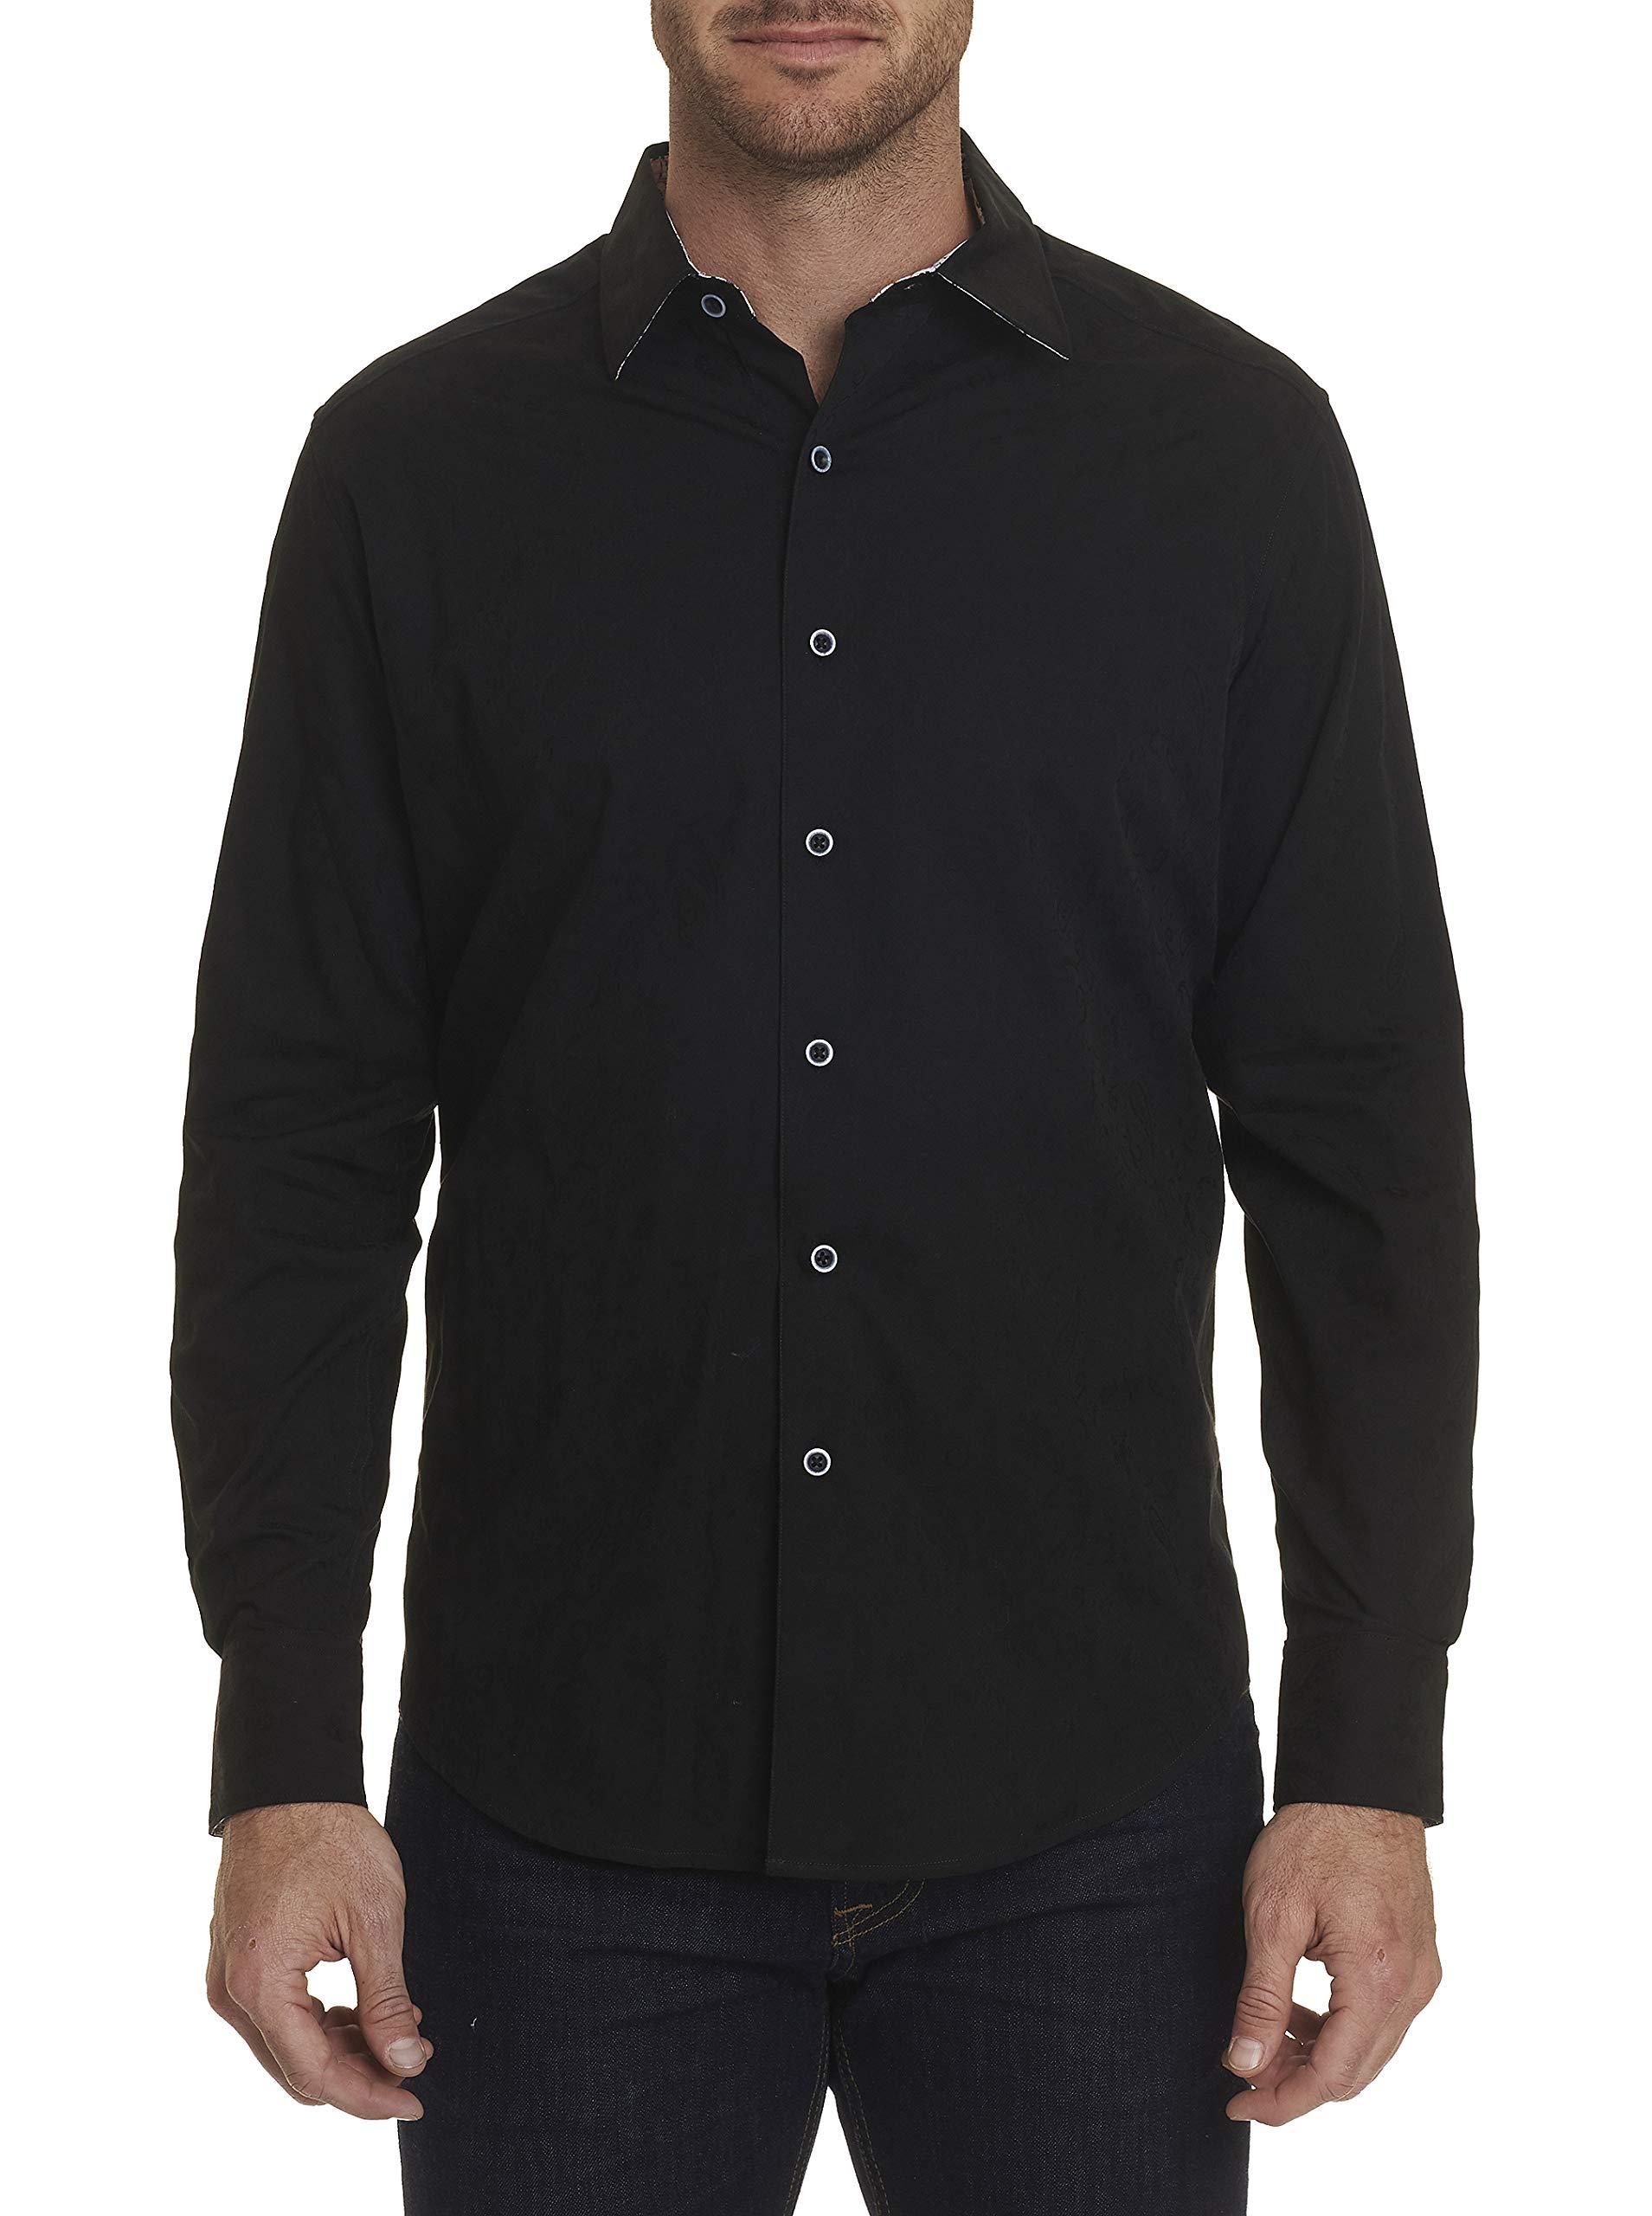 Robert Graham Hanging Gardens L/S Paisley Printed Woven Shirt Classic Fit Black XLarge